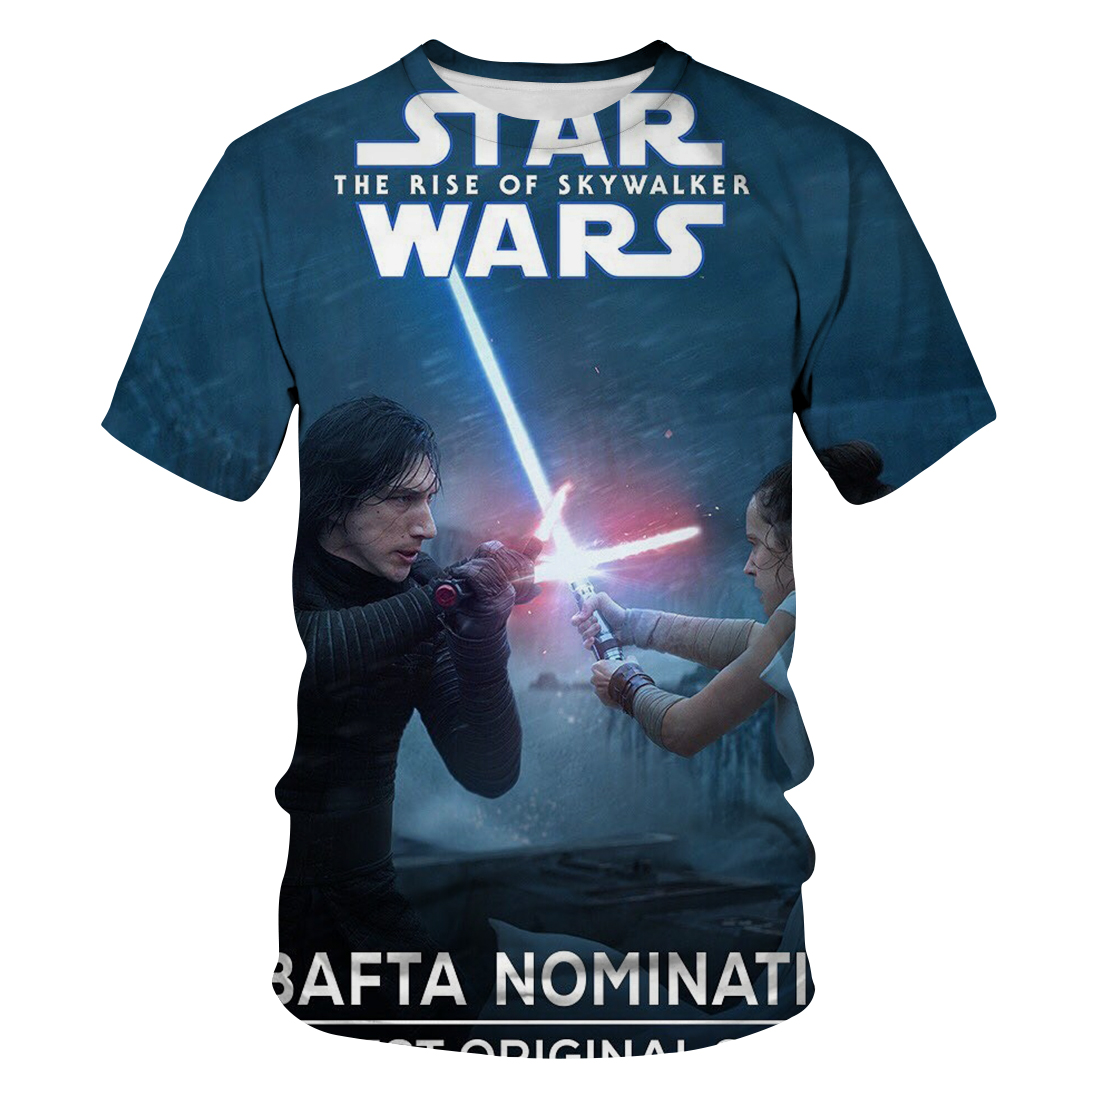 HOT SALES Star Wars Darth Vader 3D Printed Women//Men/'s Fashion T-Shirts